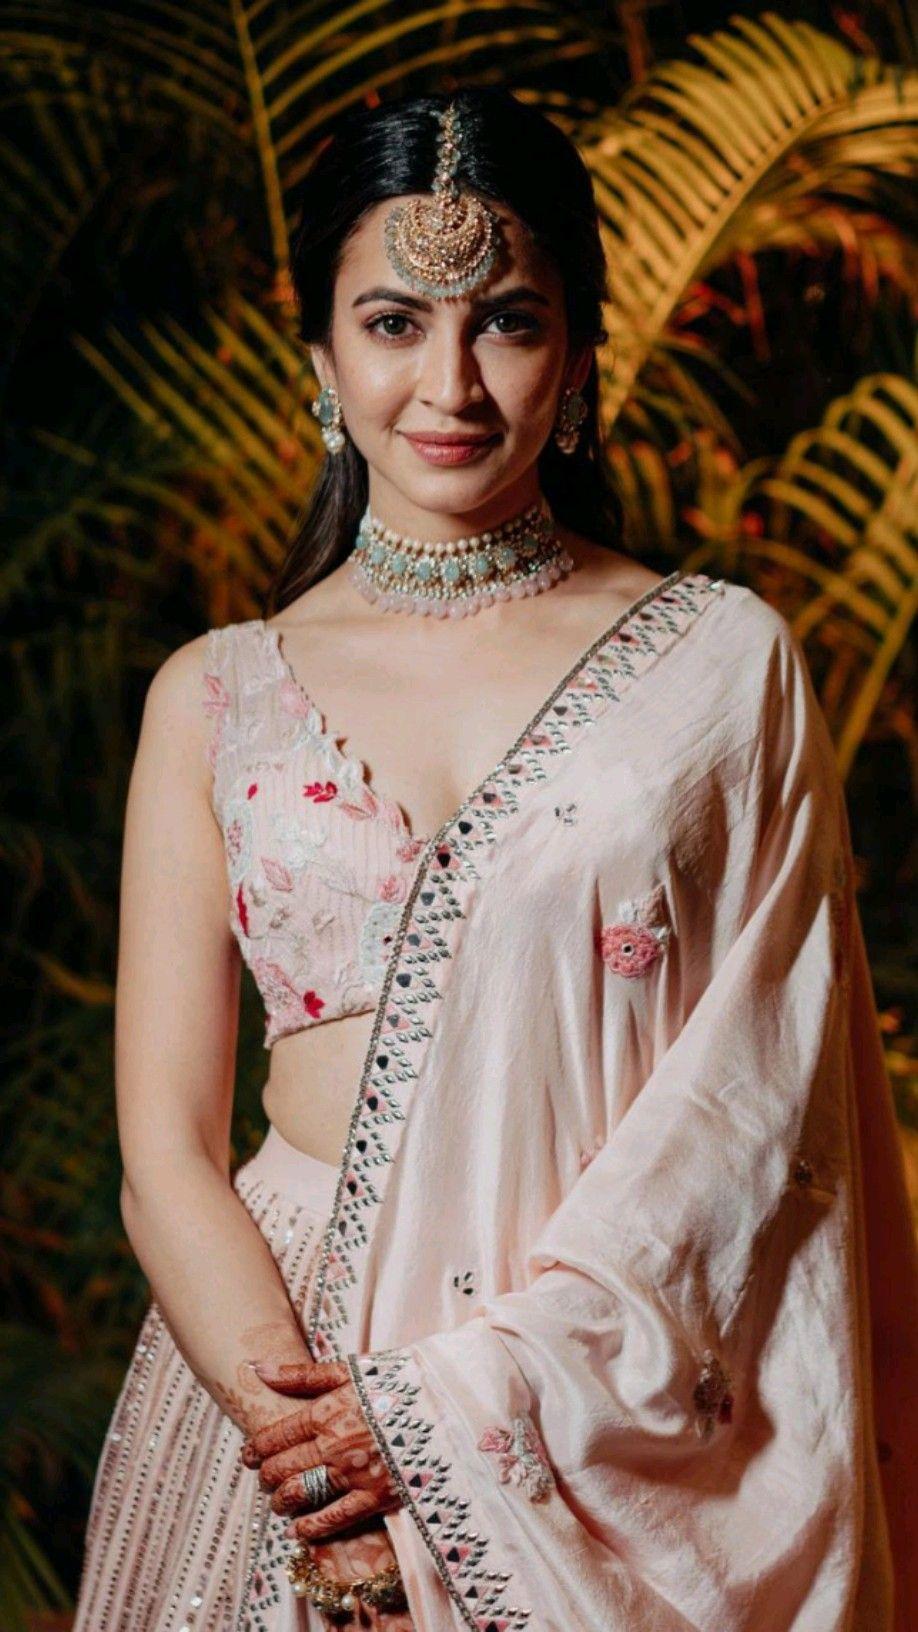 900+ Stunning Lehengas ideas in 2021 | indian bride, bridal lehenga, bridal wear